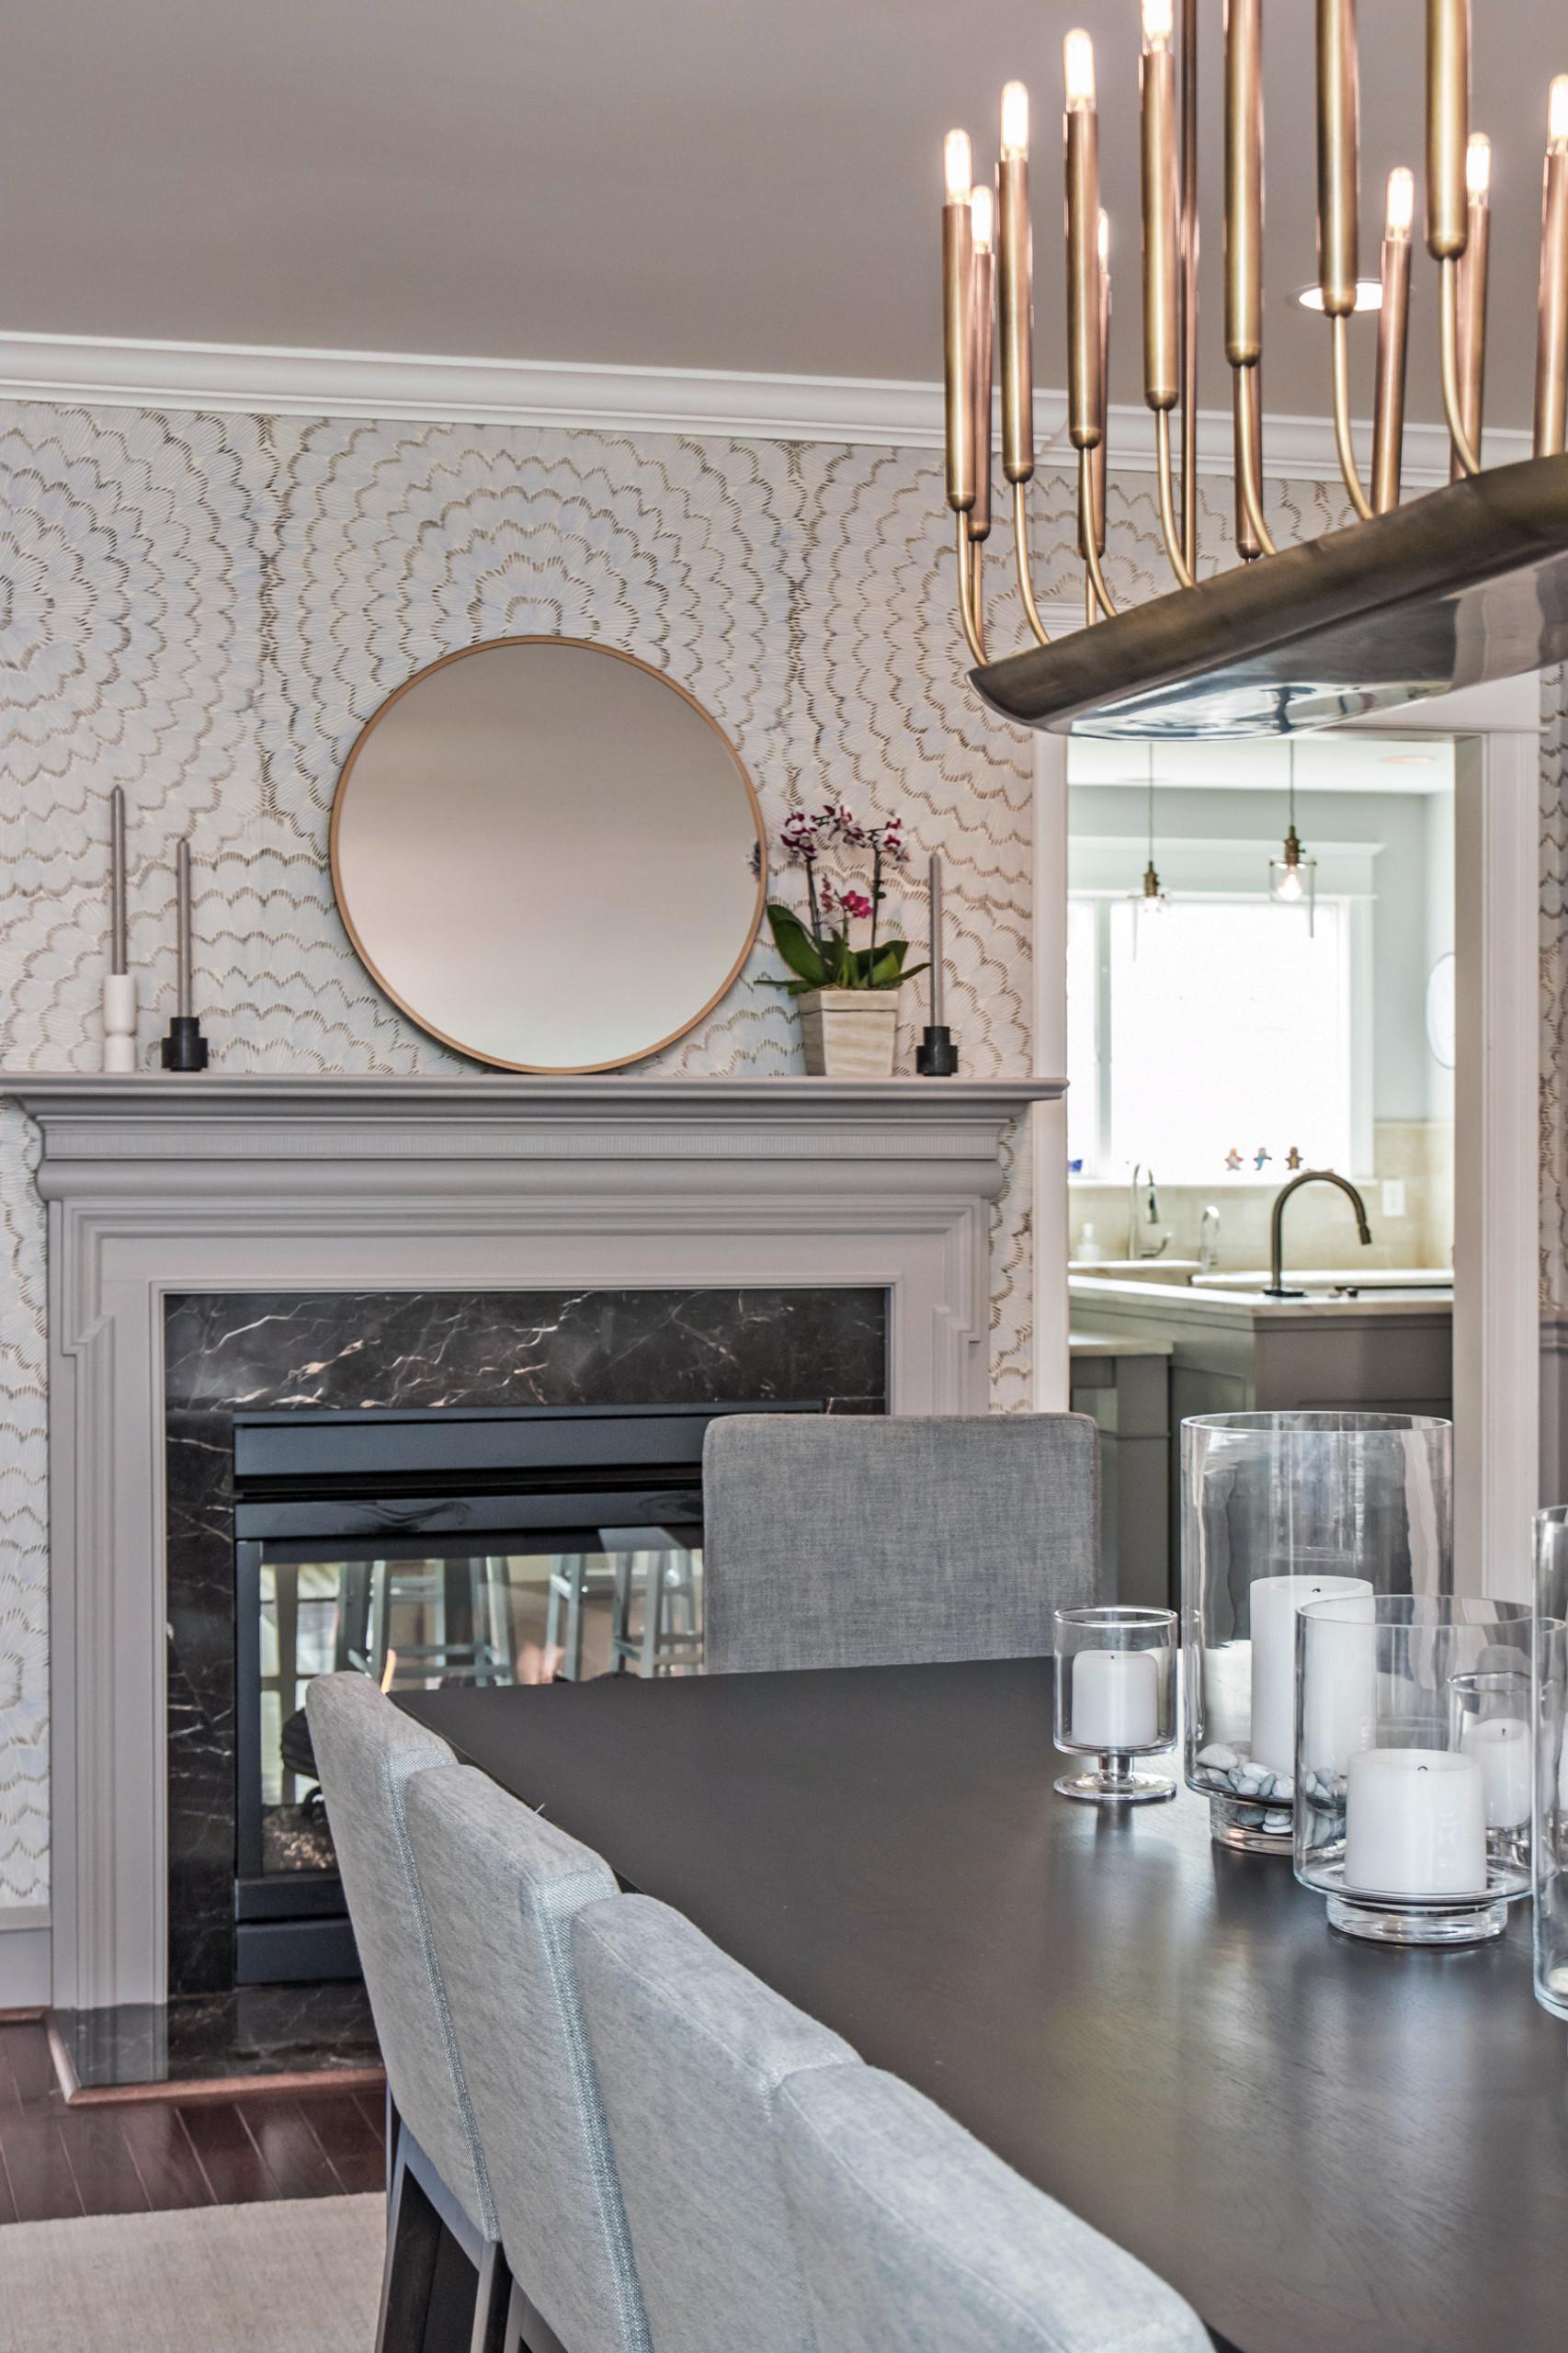 Haddonfield Dining Room